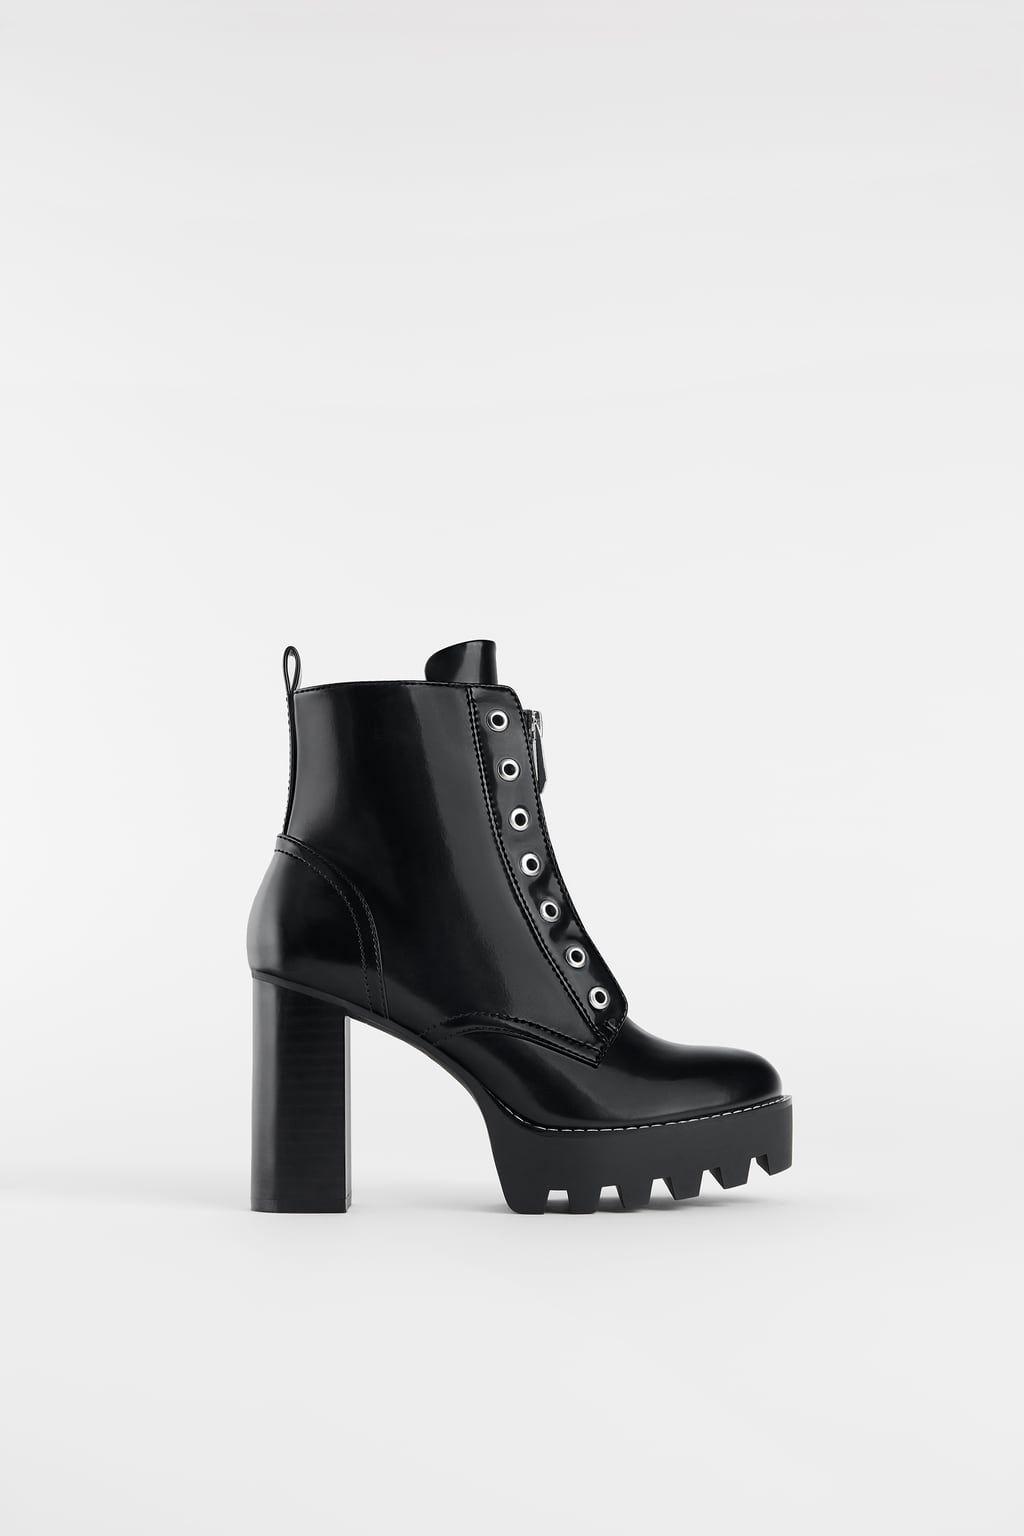 bfbc47a4 BOTÍN TRACK | zapatos ❤ in 2019 | Zapatos, Zapatos botines, Botines ...